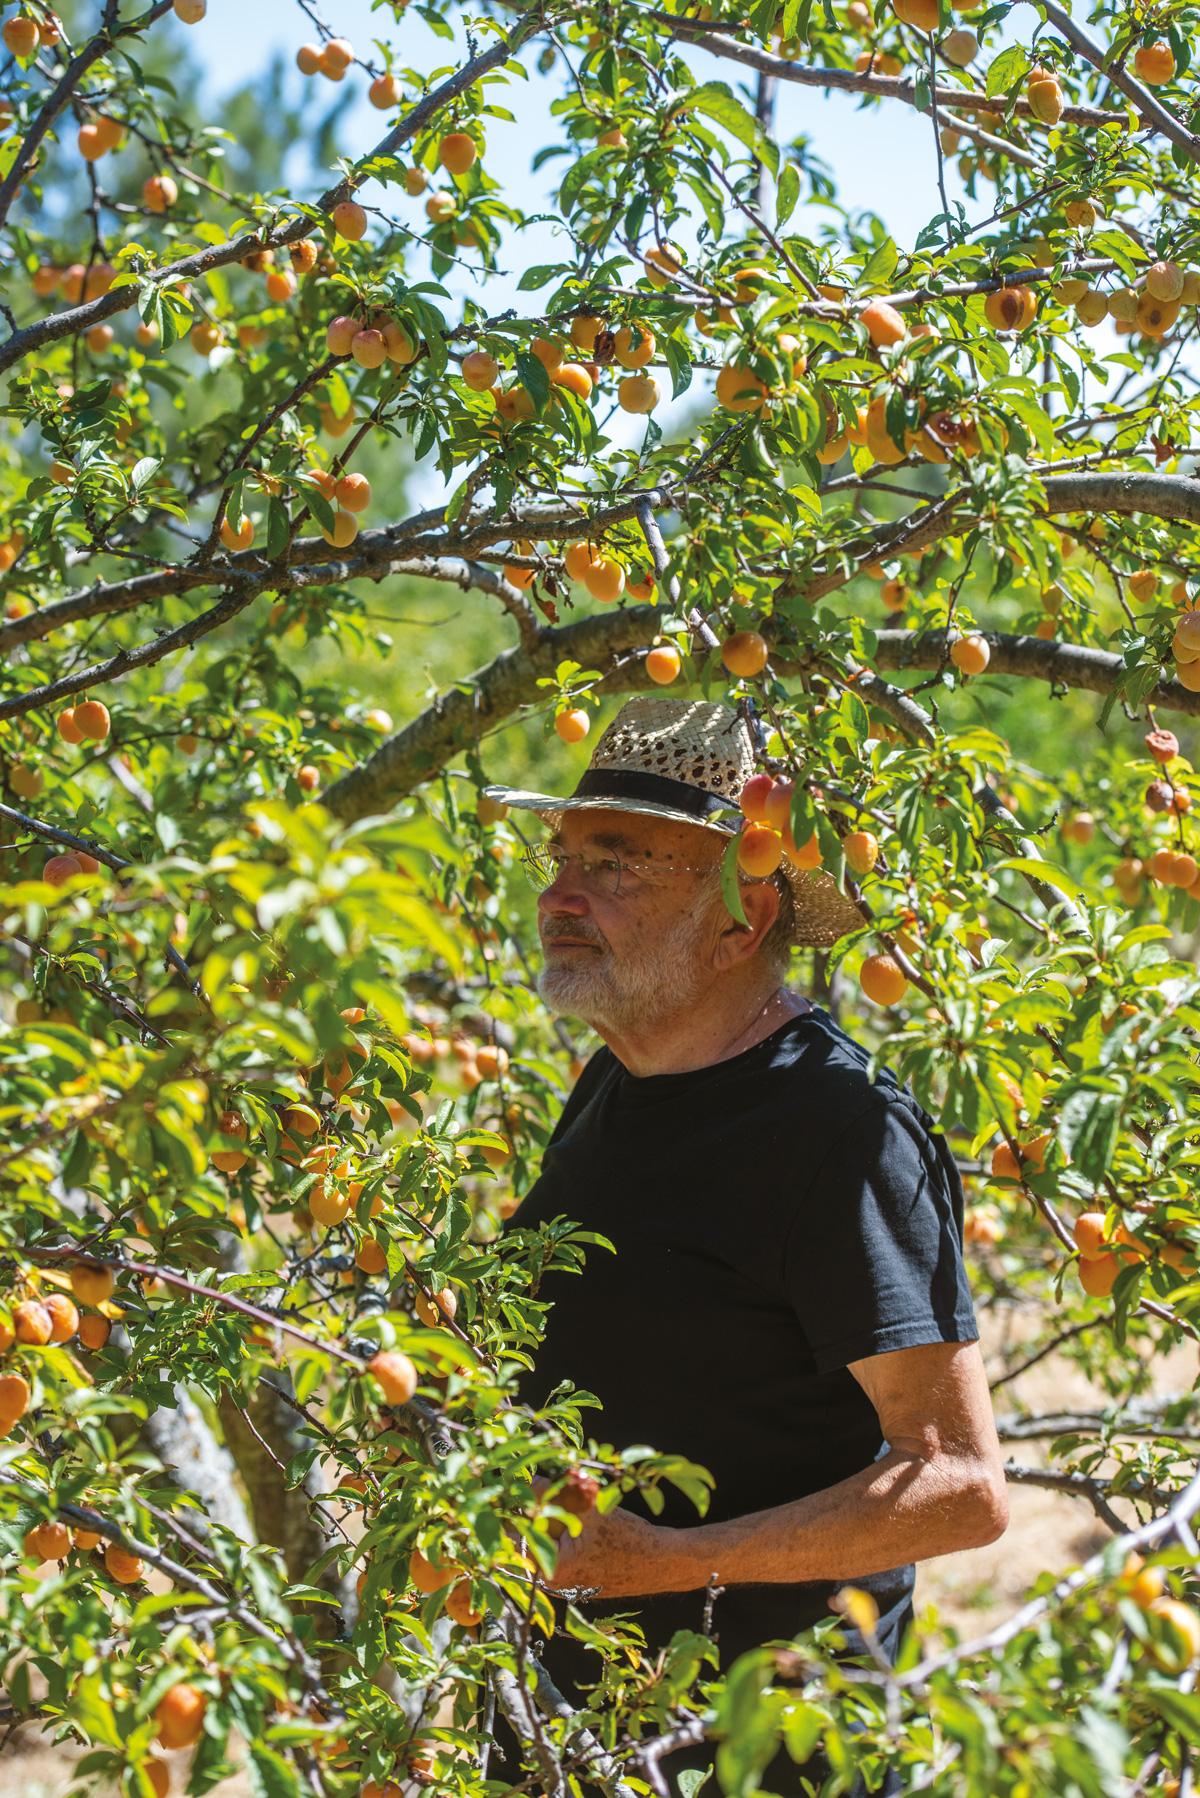 Robert Kran, l'homme qui plantait des arbres - Dominique Memmi - Quì magazine